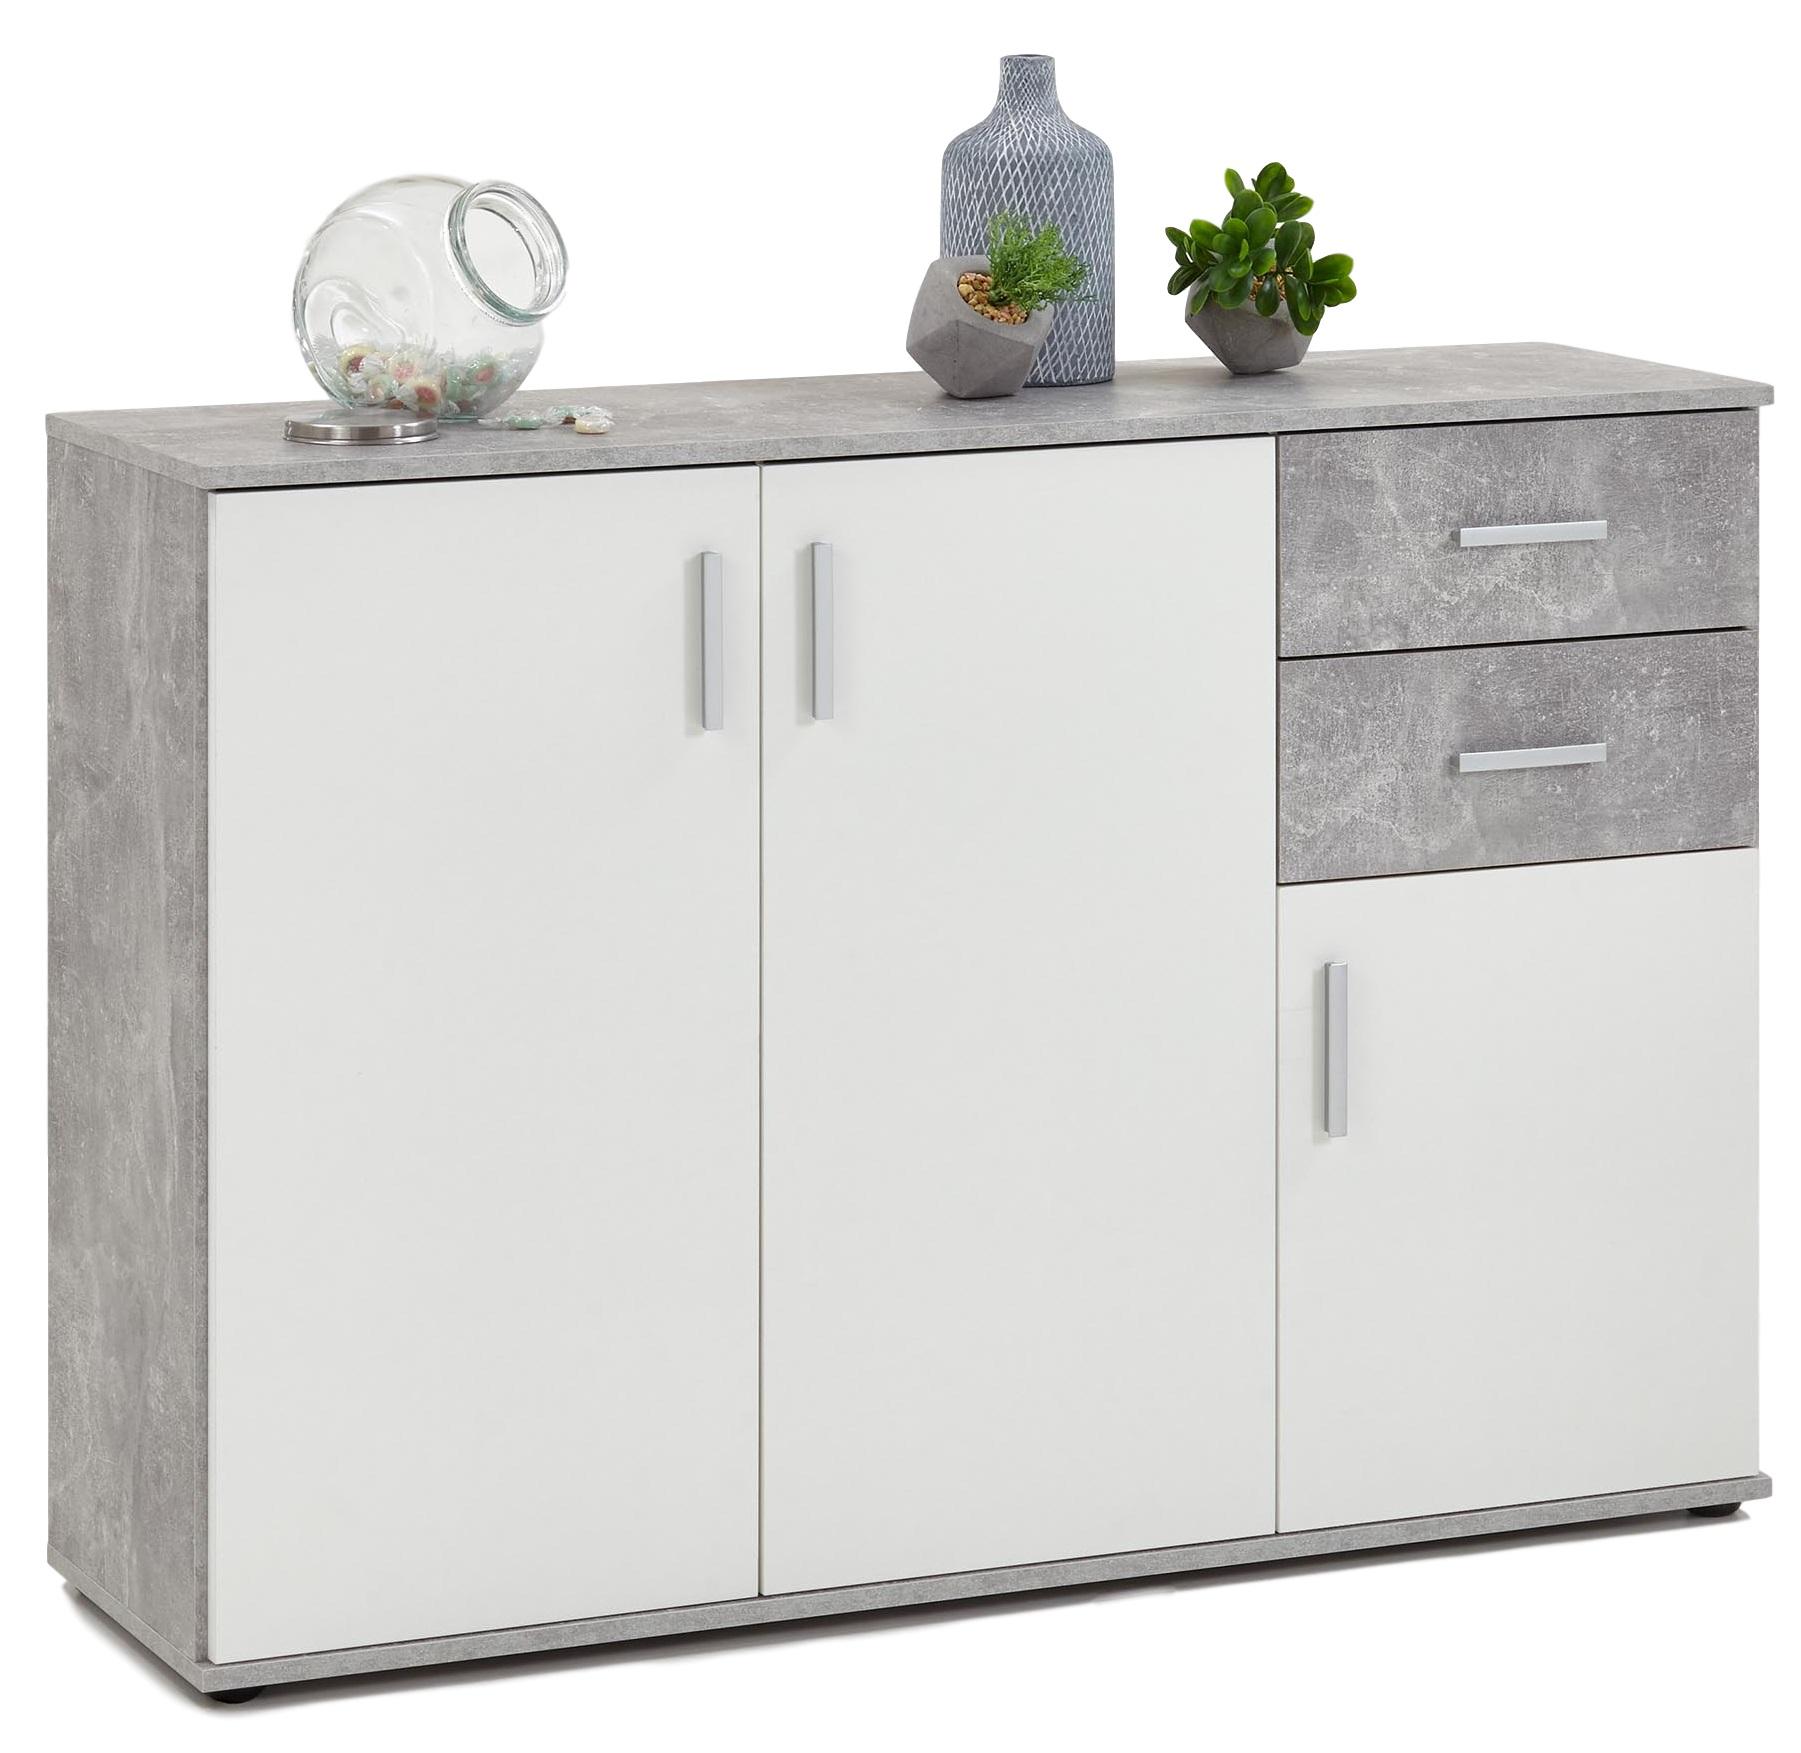 FD Furniture tv meubel dressoir Albi 120 cm breed Grijs beton met wit